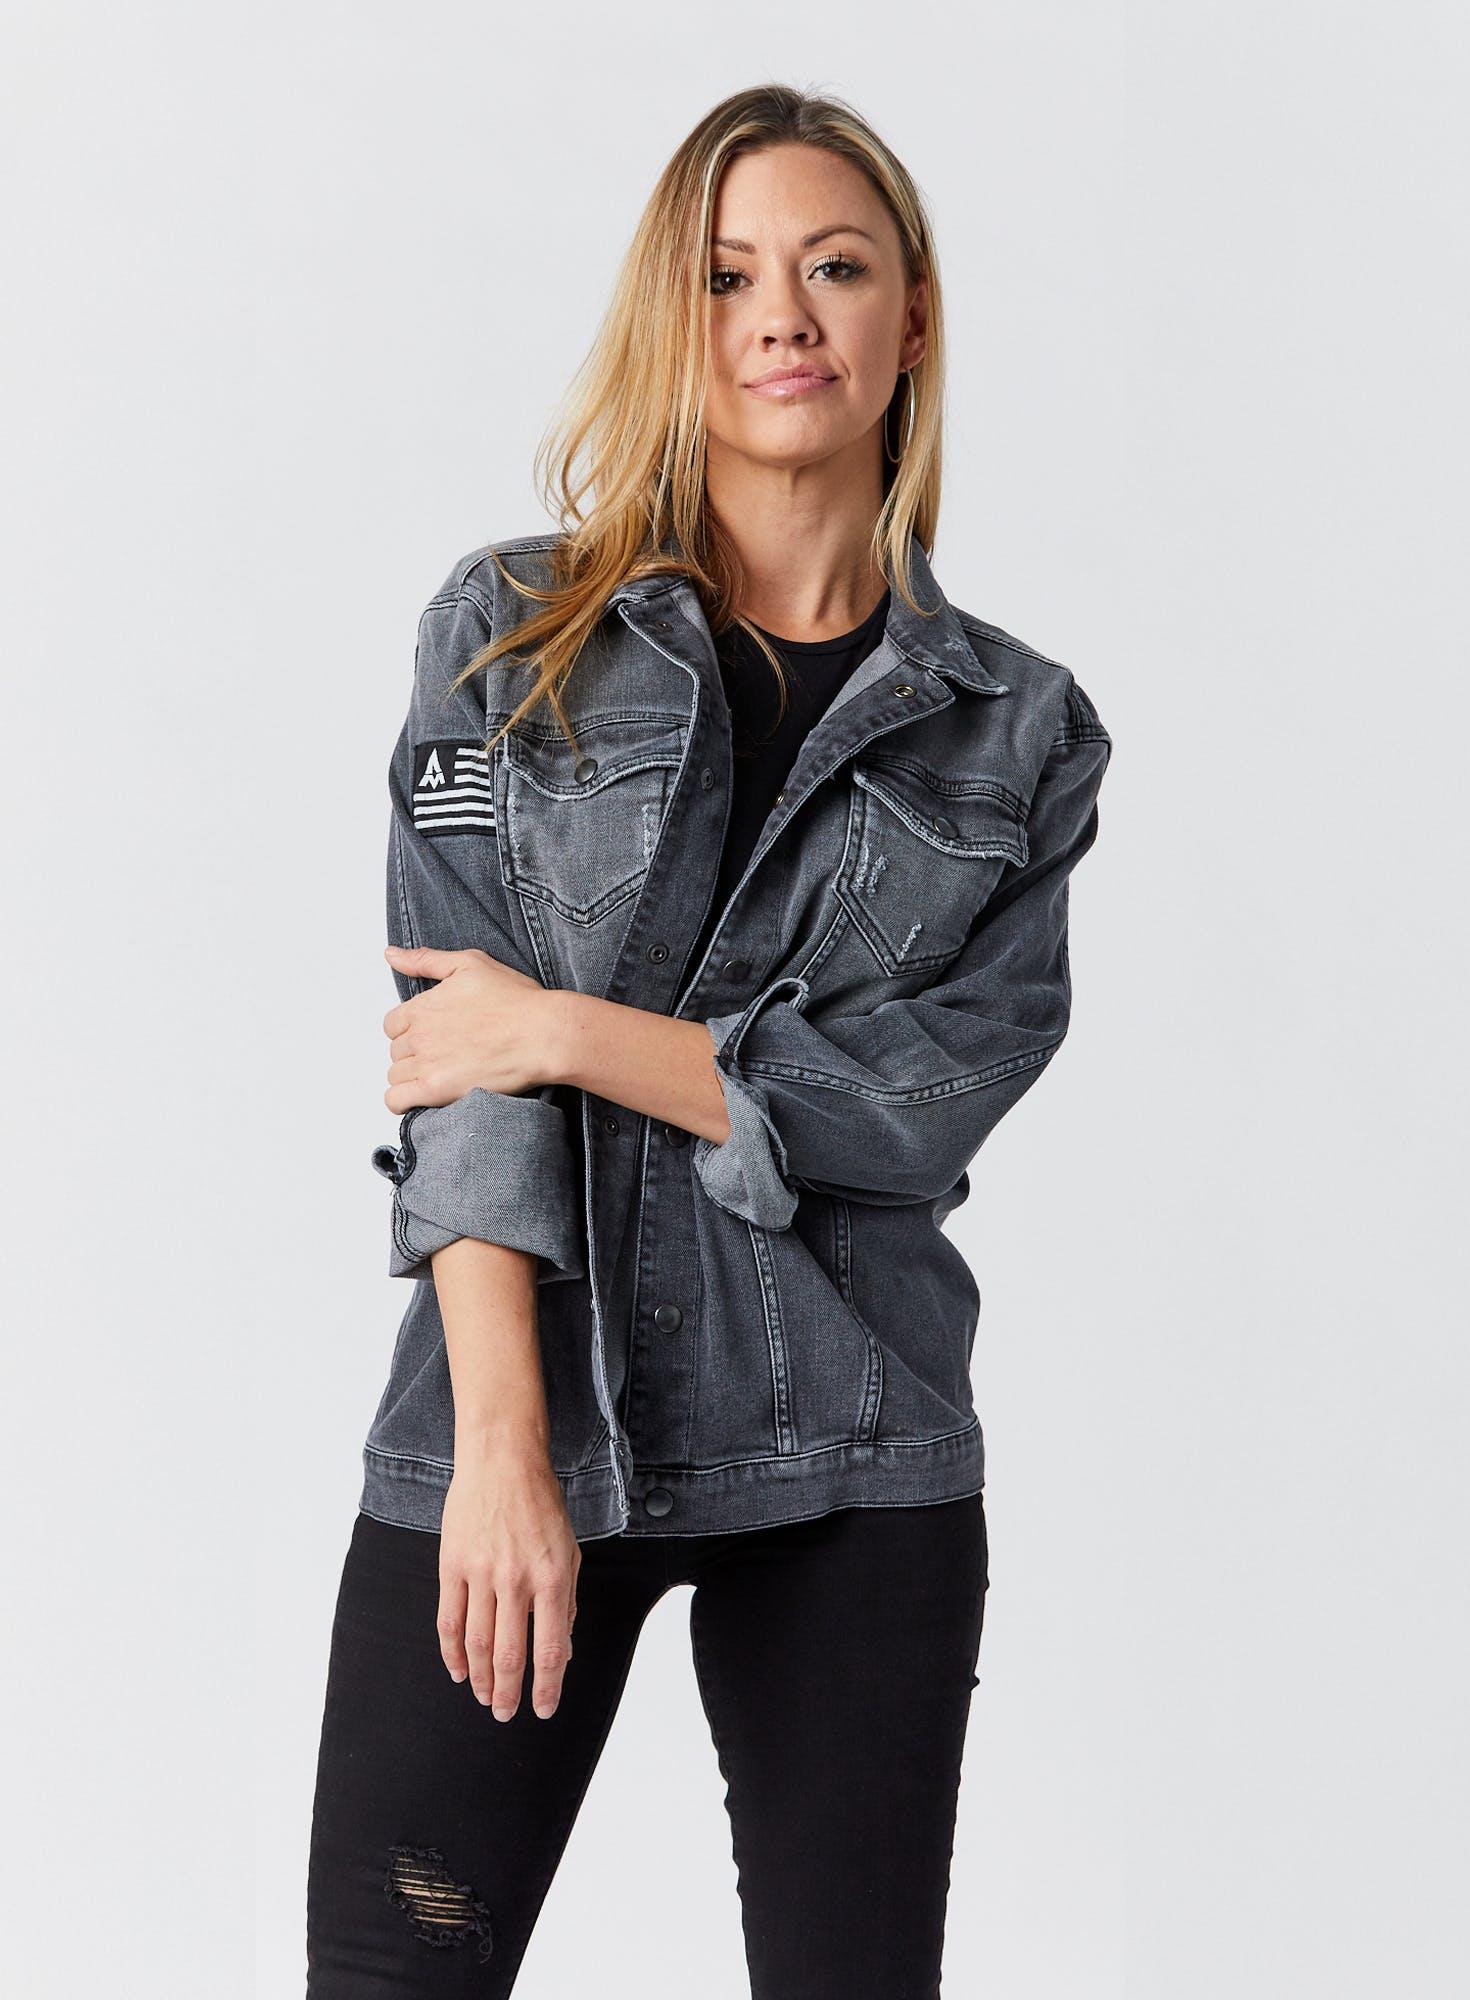 The Denim Jacket Bonus Image